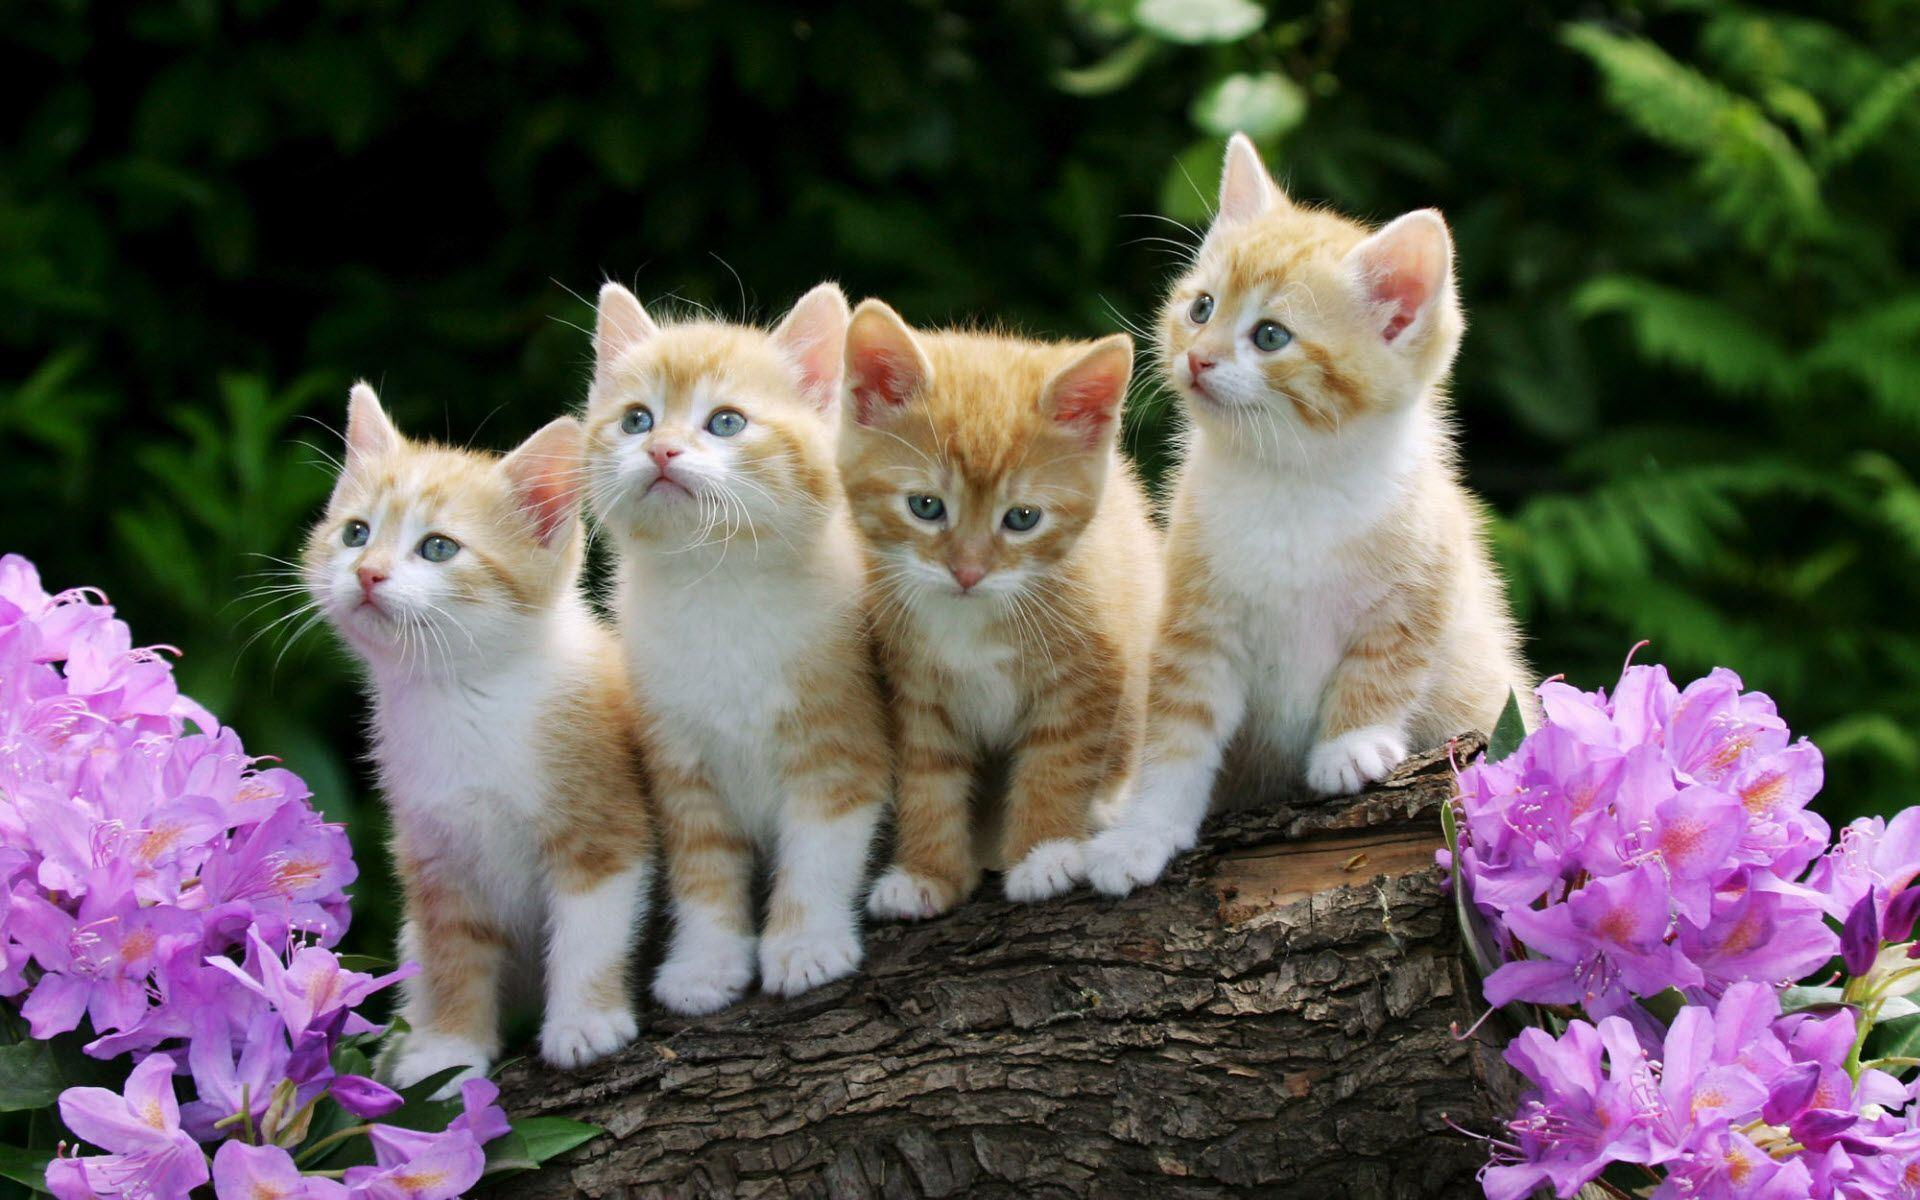 Cute Kittens Wallpapers 9674 Full HD Wallpaper Desktop - Res ...